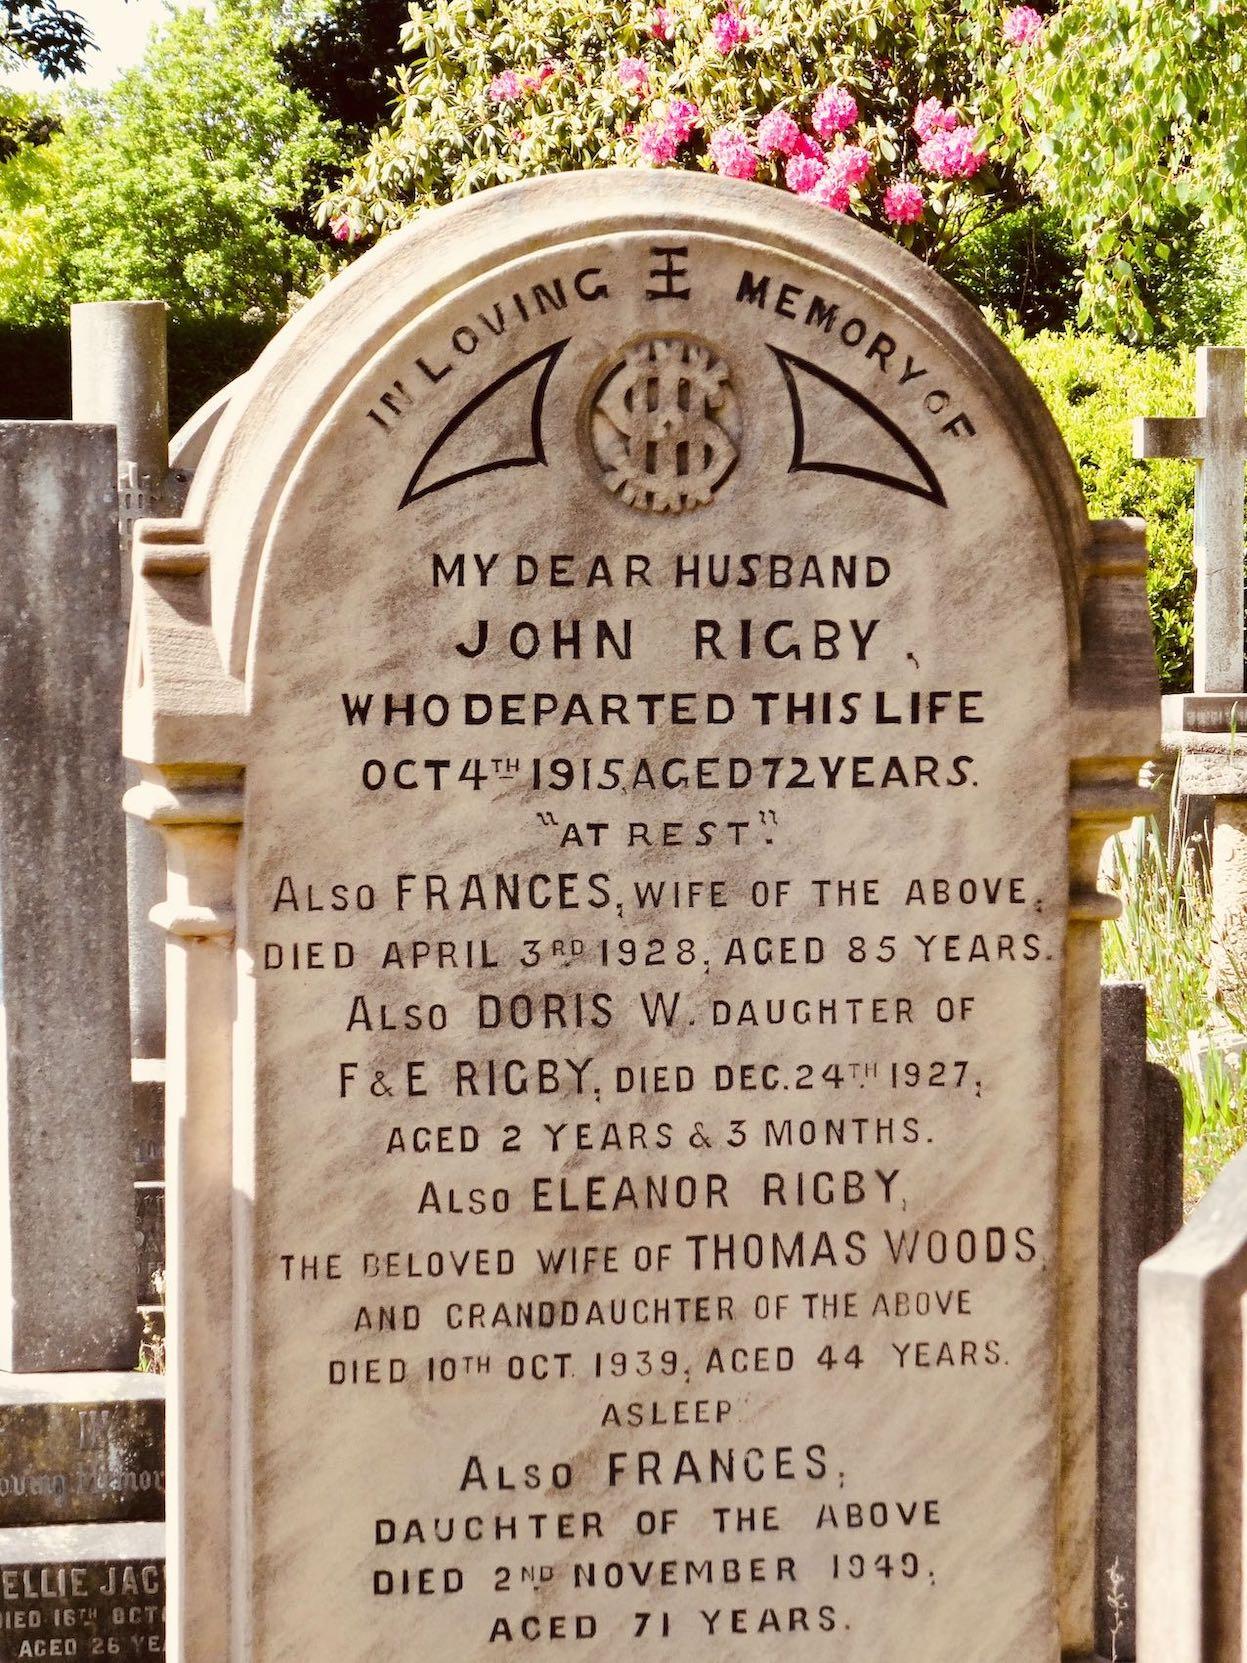 Eleanor Rigby grave Liverpool.